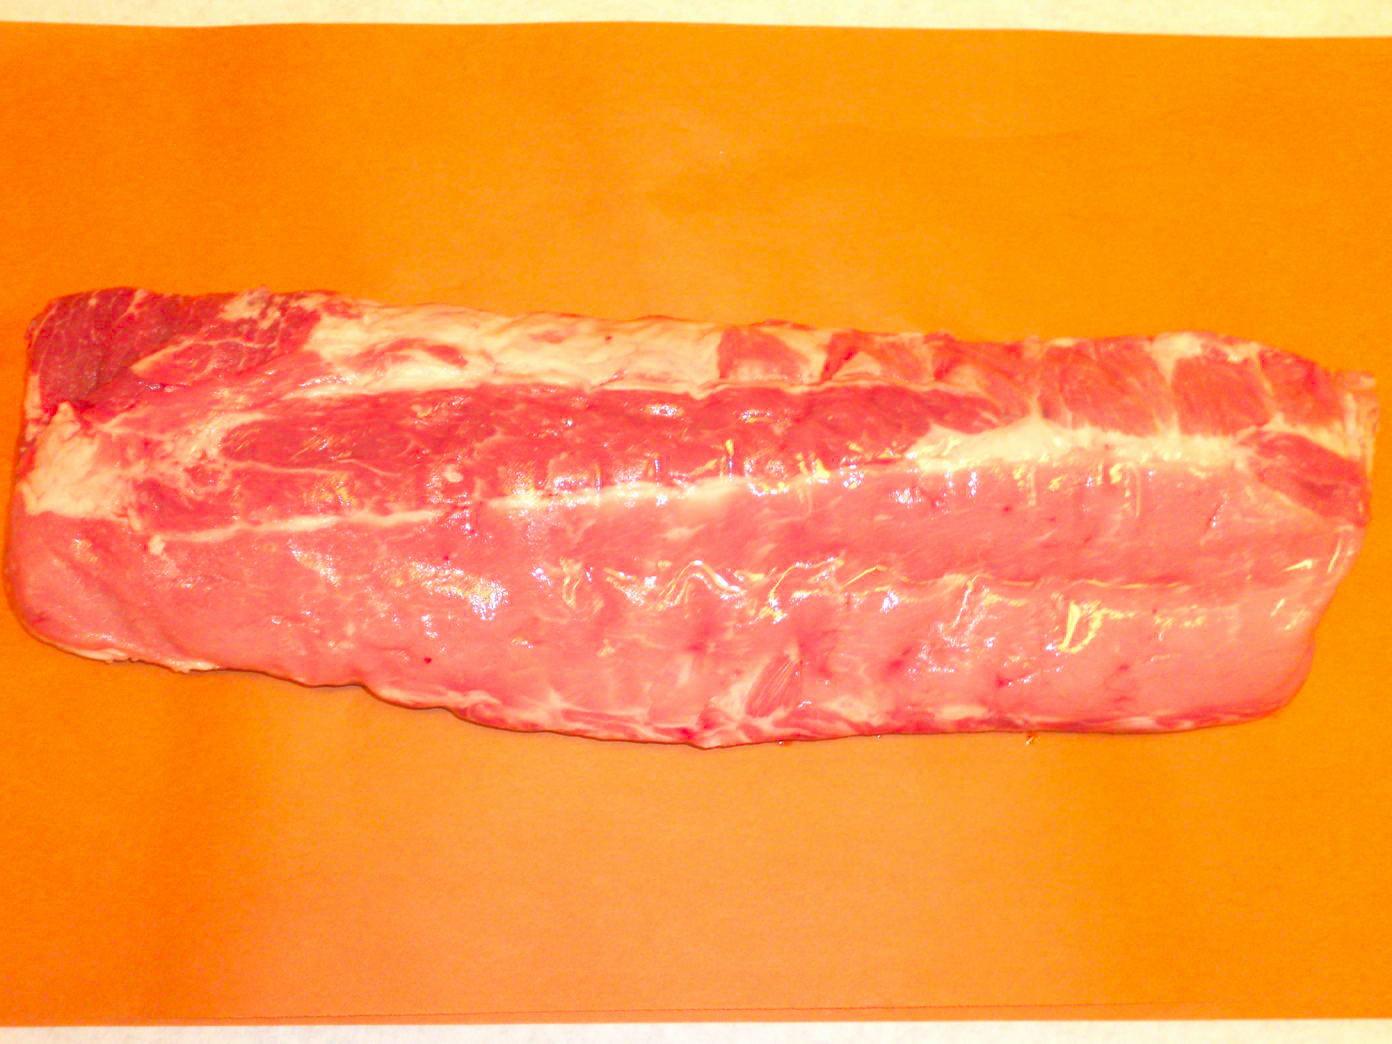 How To Cook Pork Loin Back Ribs  butcherblog How to Cook Pork Loin Back Ribs Baby